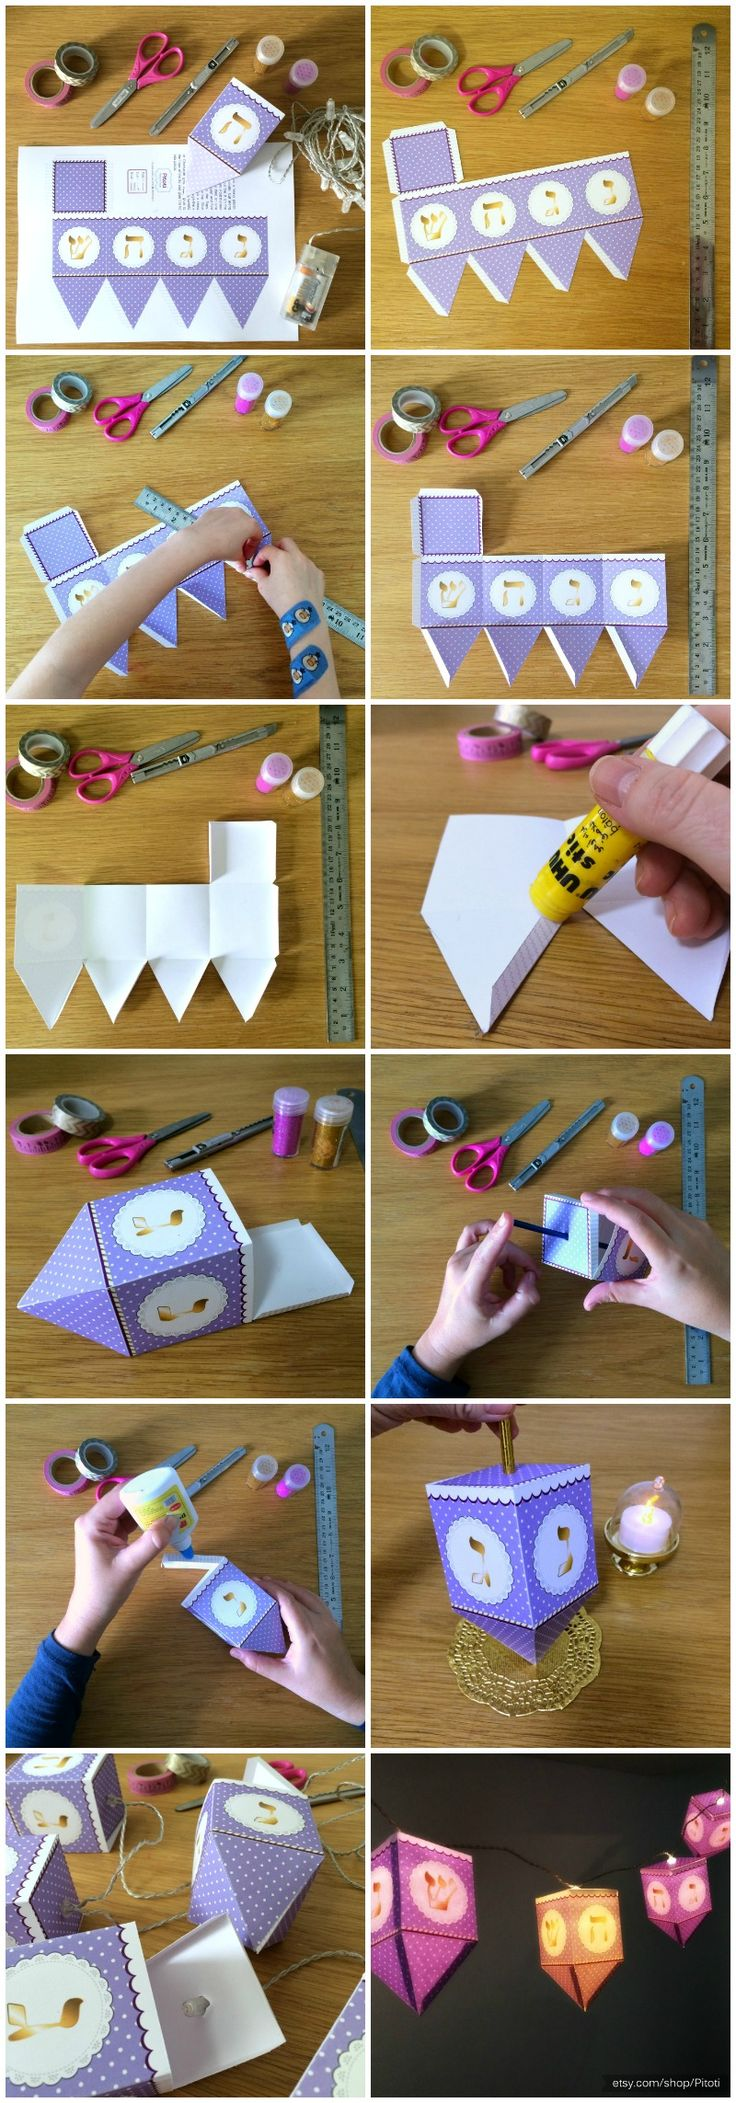 Hanukkah Dreidel Paper Craft, printable Dreidel template to creat 3D Paper Dreidels favors or Hanukkah Decorations - Instant download.